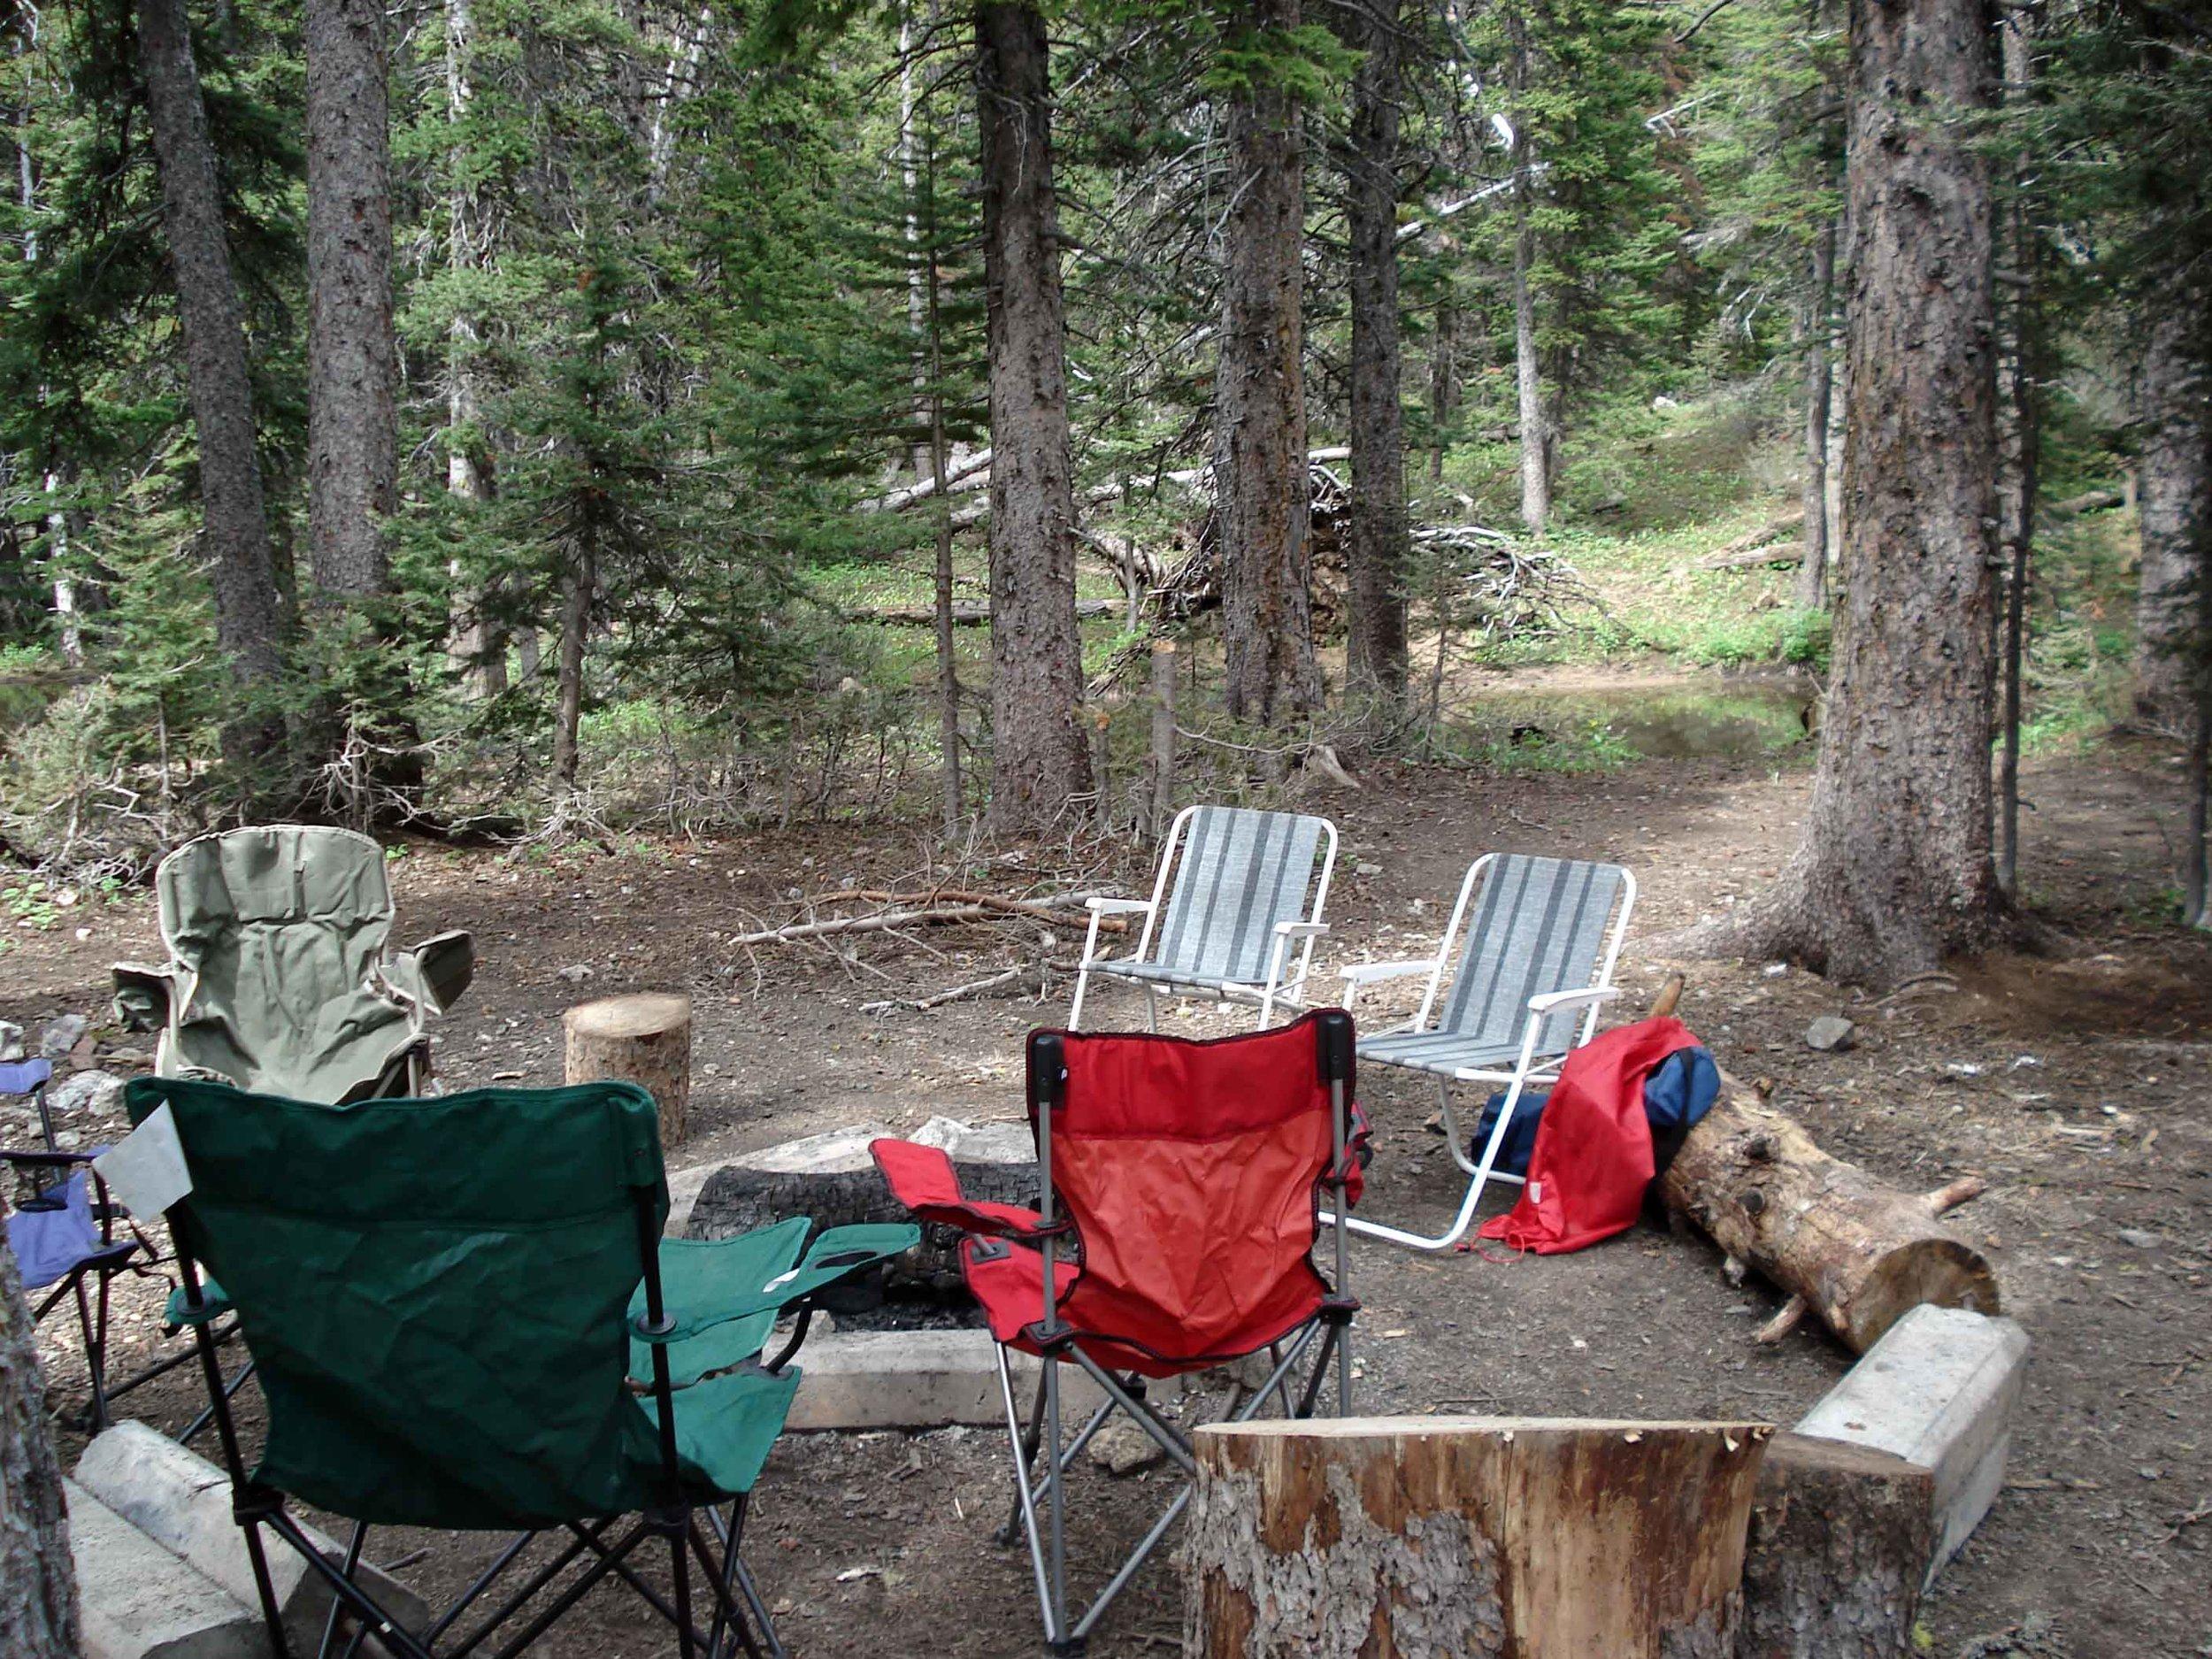 Camping near Fairy Lake near Bozeman, Montana